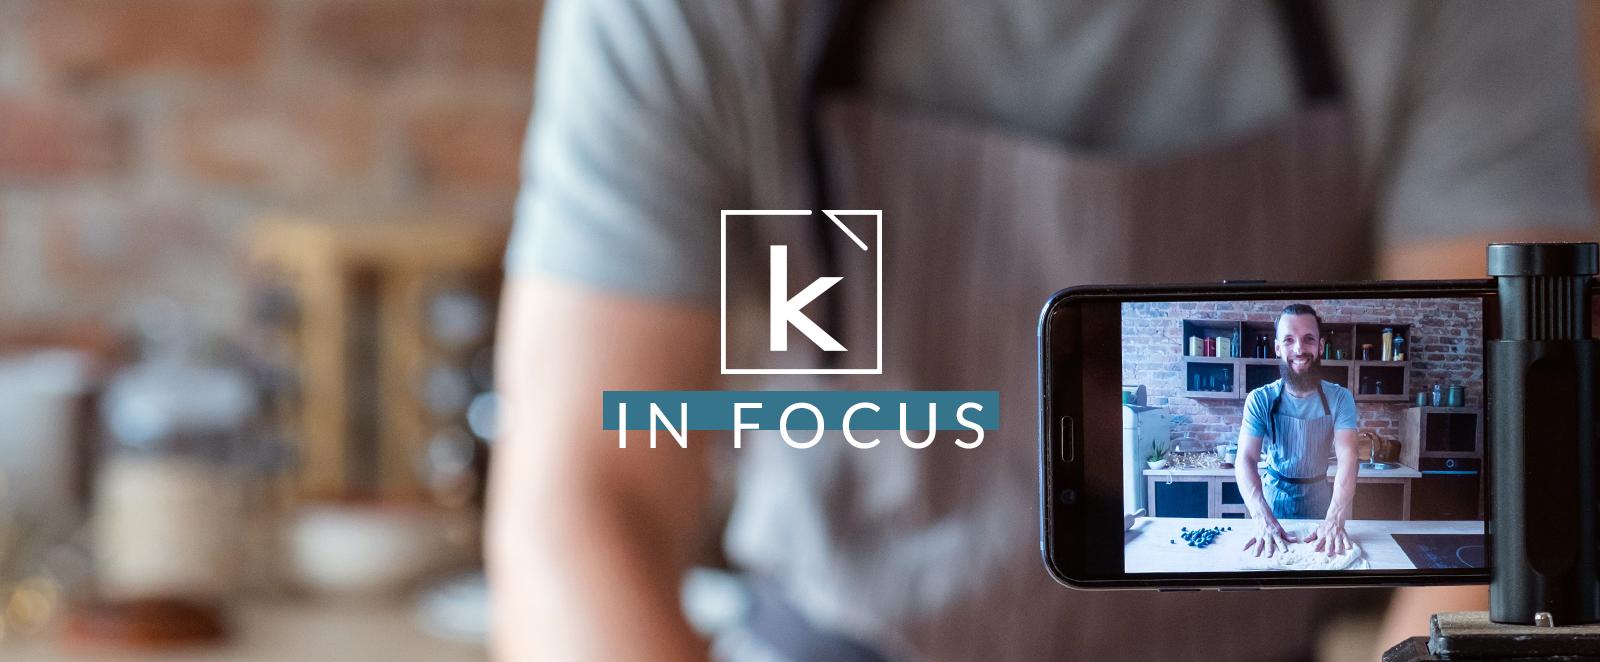 filming-baker-on-iphone-in-focus-blog-header